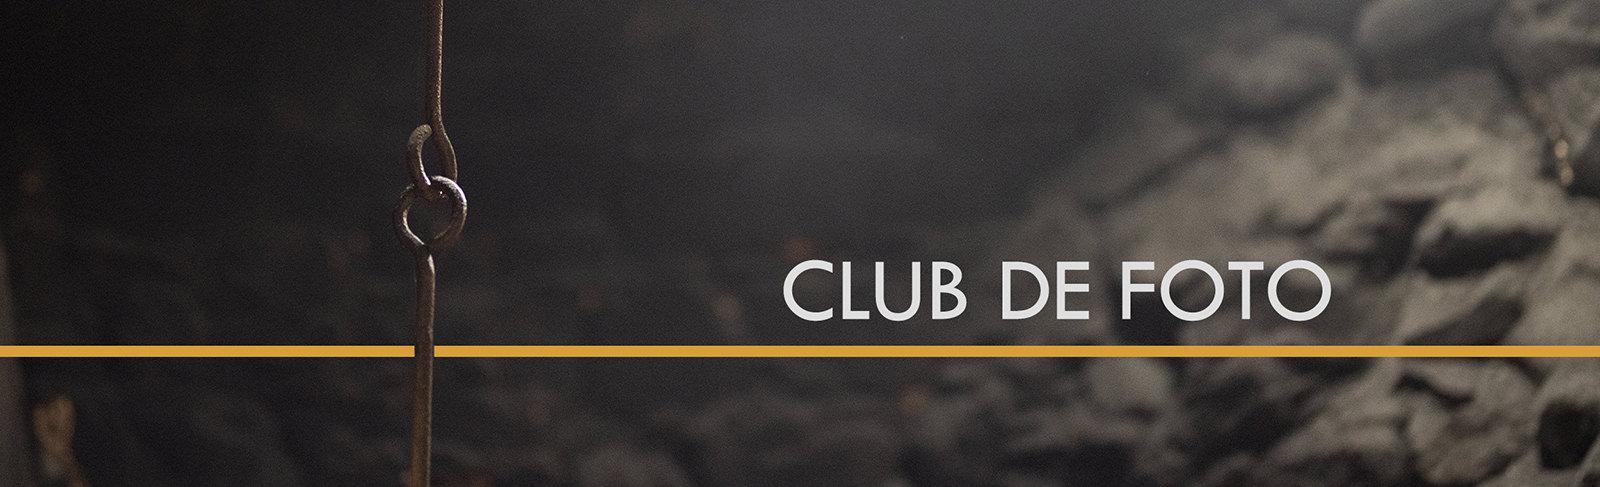 club fotografia l2q2